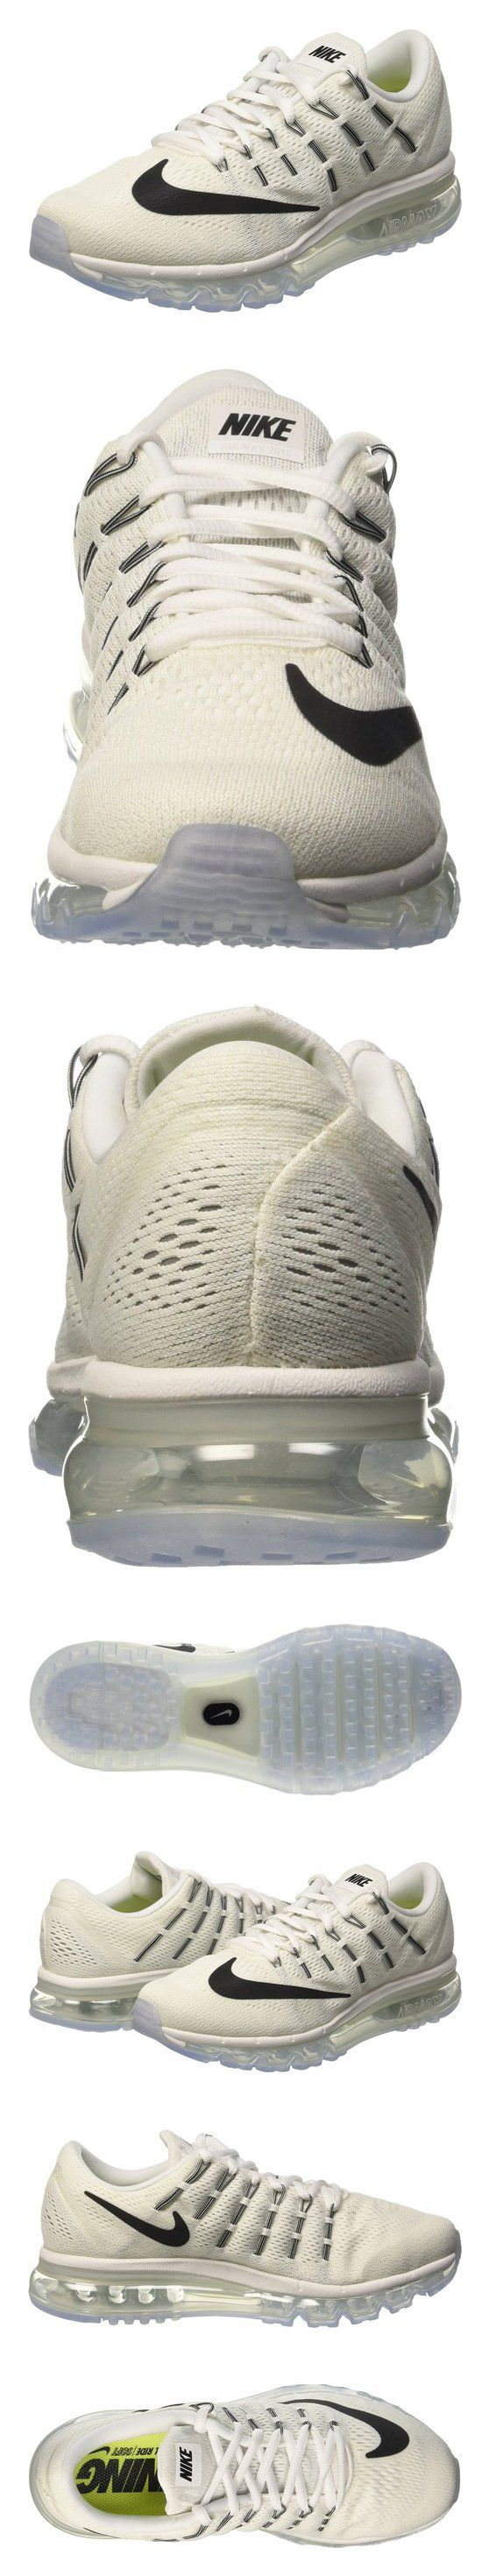 $249.98 - Nike Women's Air Max 2016 Summit White/White/Black Mesh Running Shoes 8.5 M US #shoes #nike